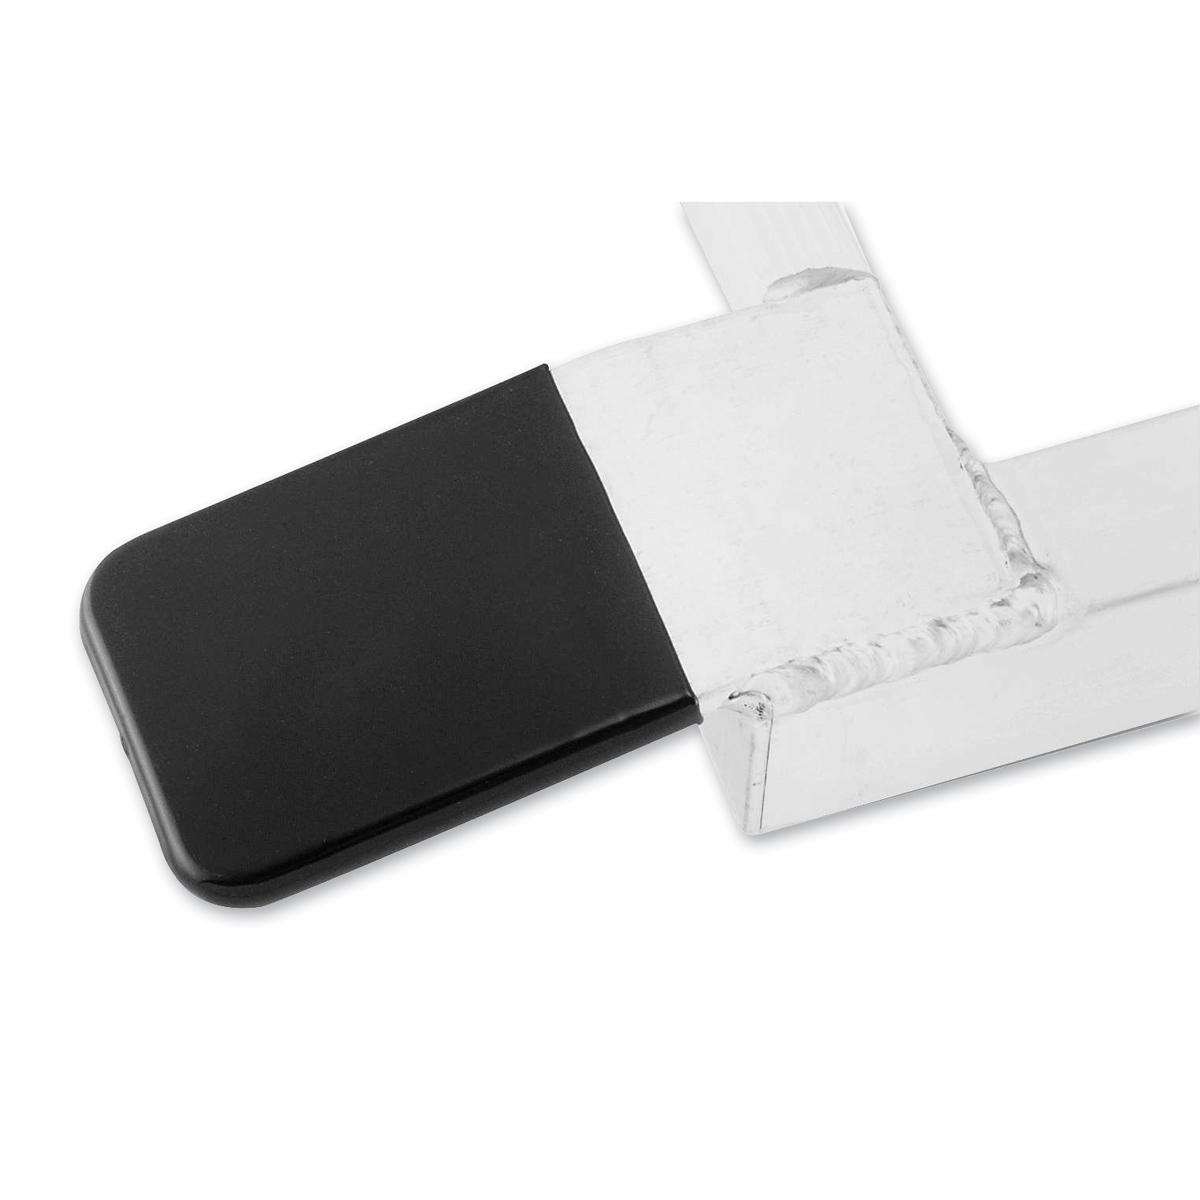 Quadboss Replacement Vinyl Tips for Quadlight Bi-Fold Ramp